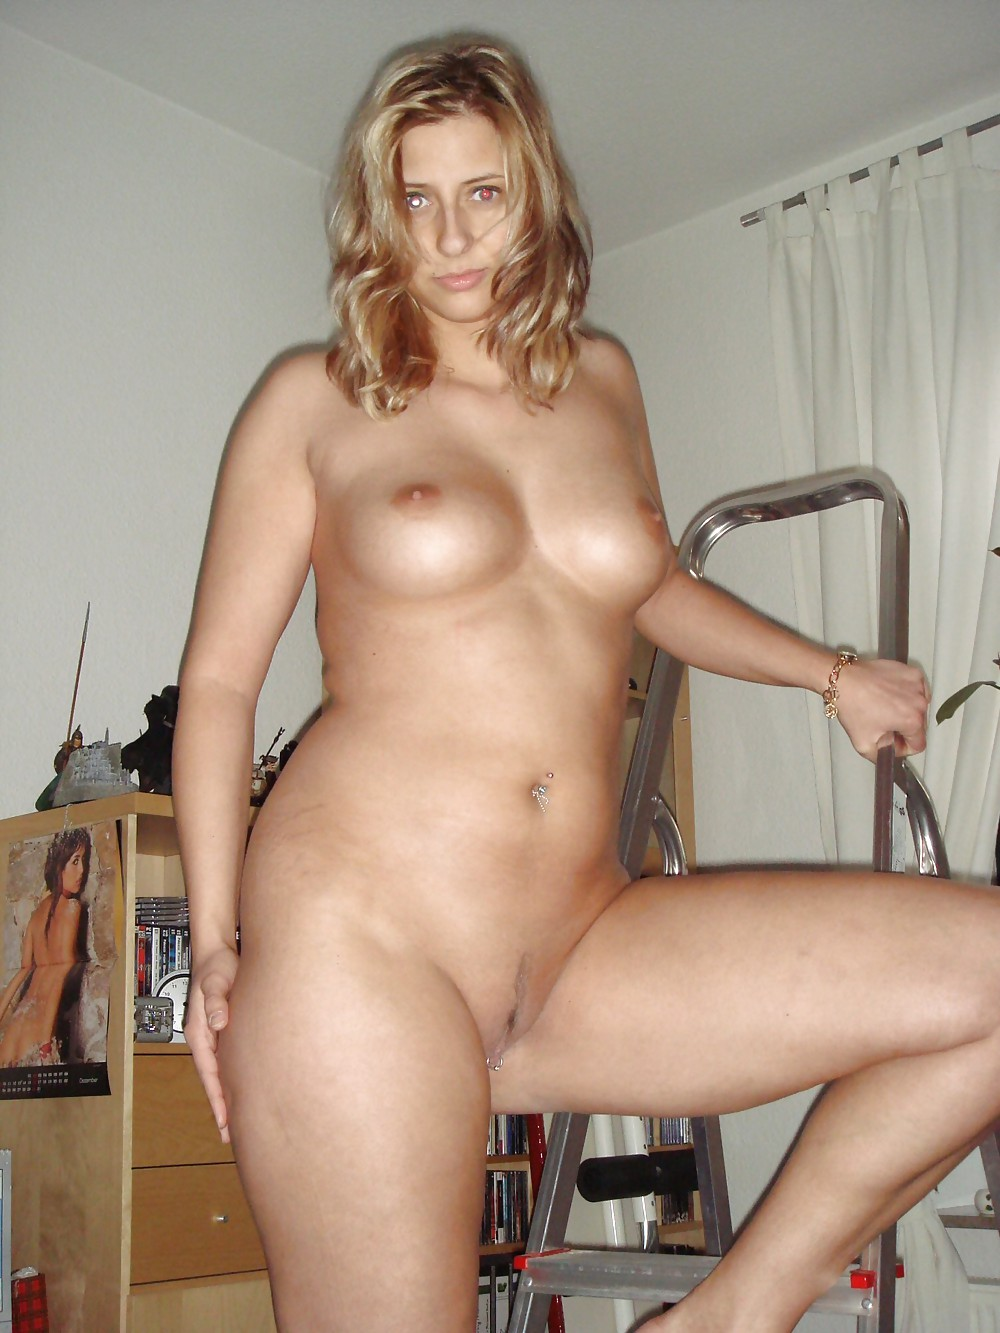 http://hotamateurmature.com/gallery/Housewives_milf_mature_elders/3.jpg